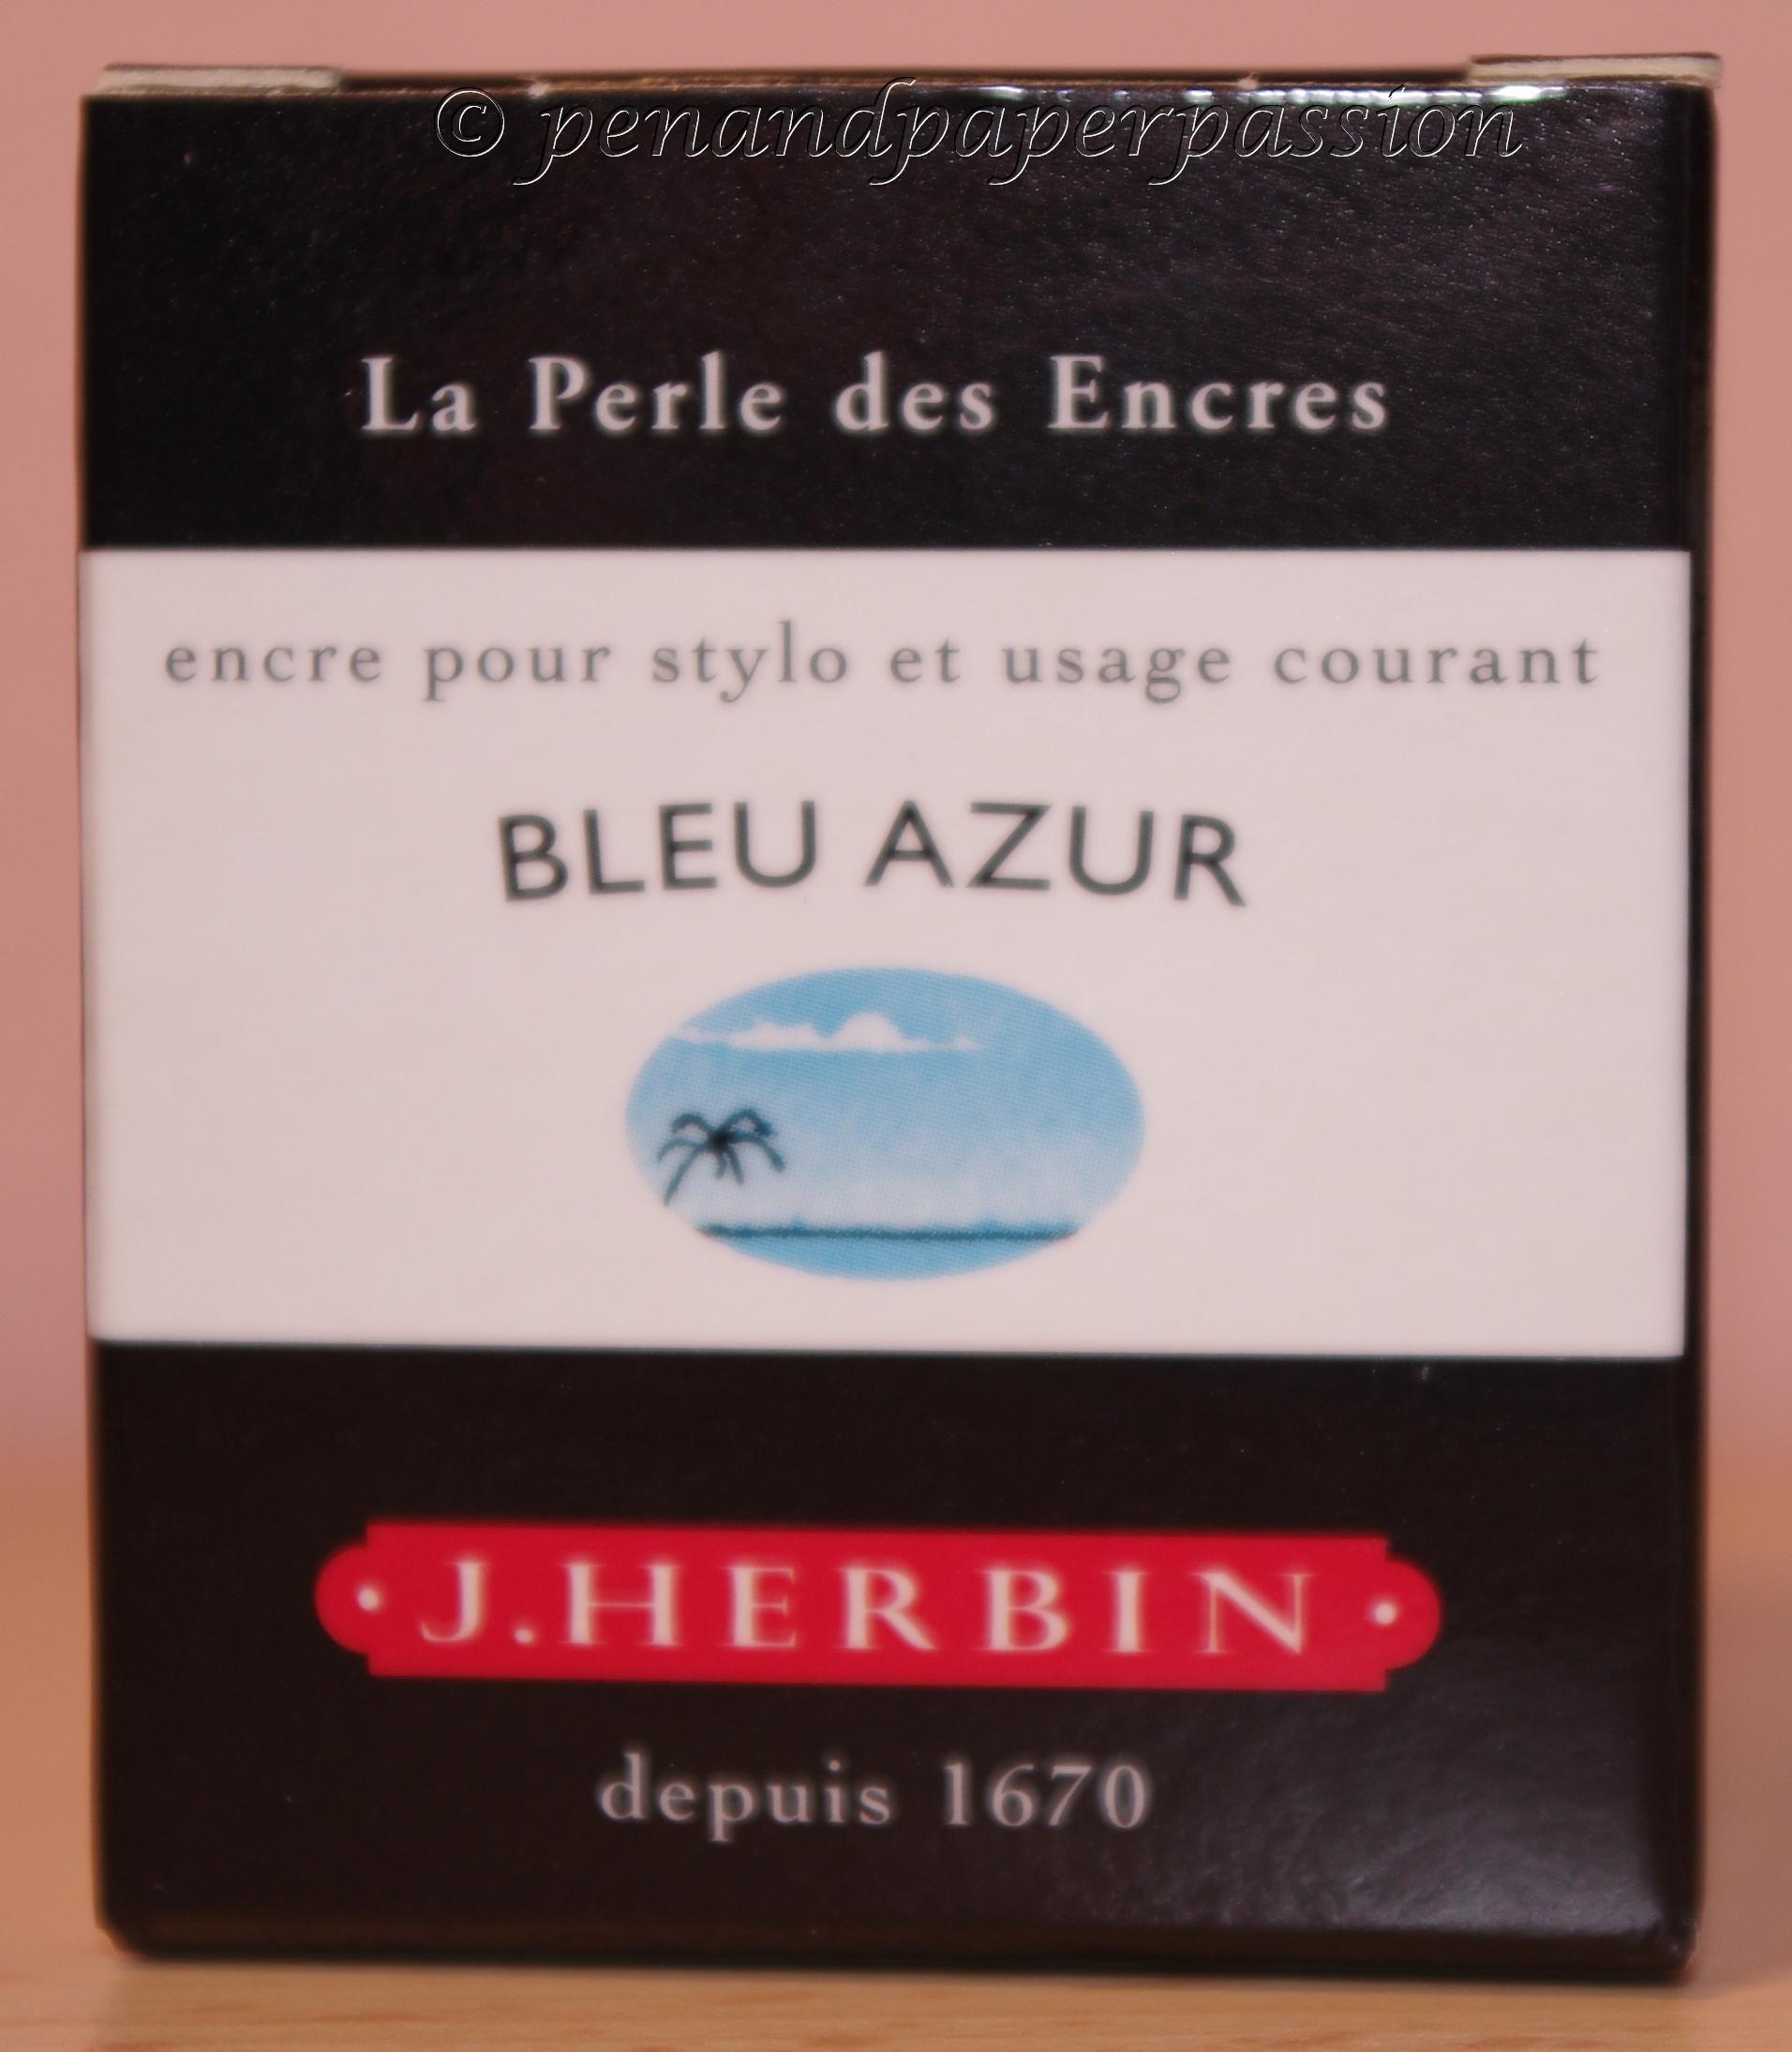 Foto J. Herbin Bleu Azur Verpackung